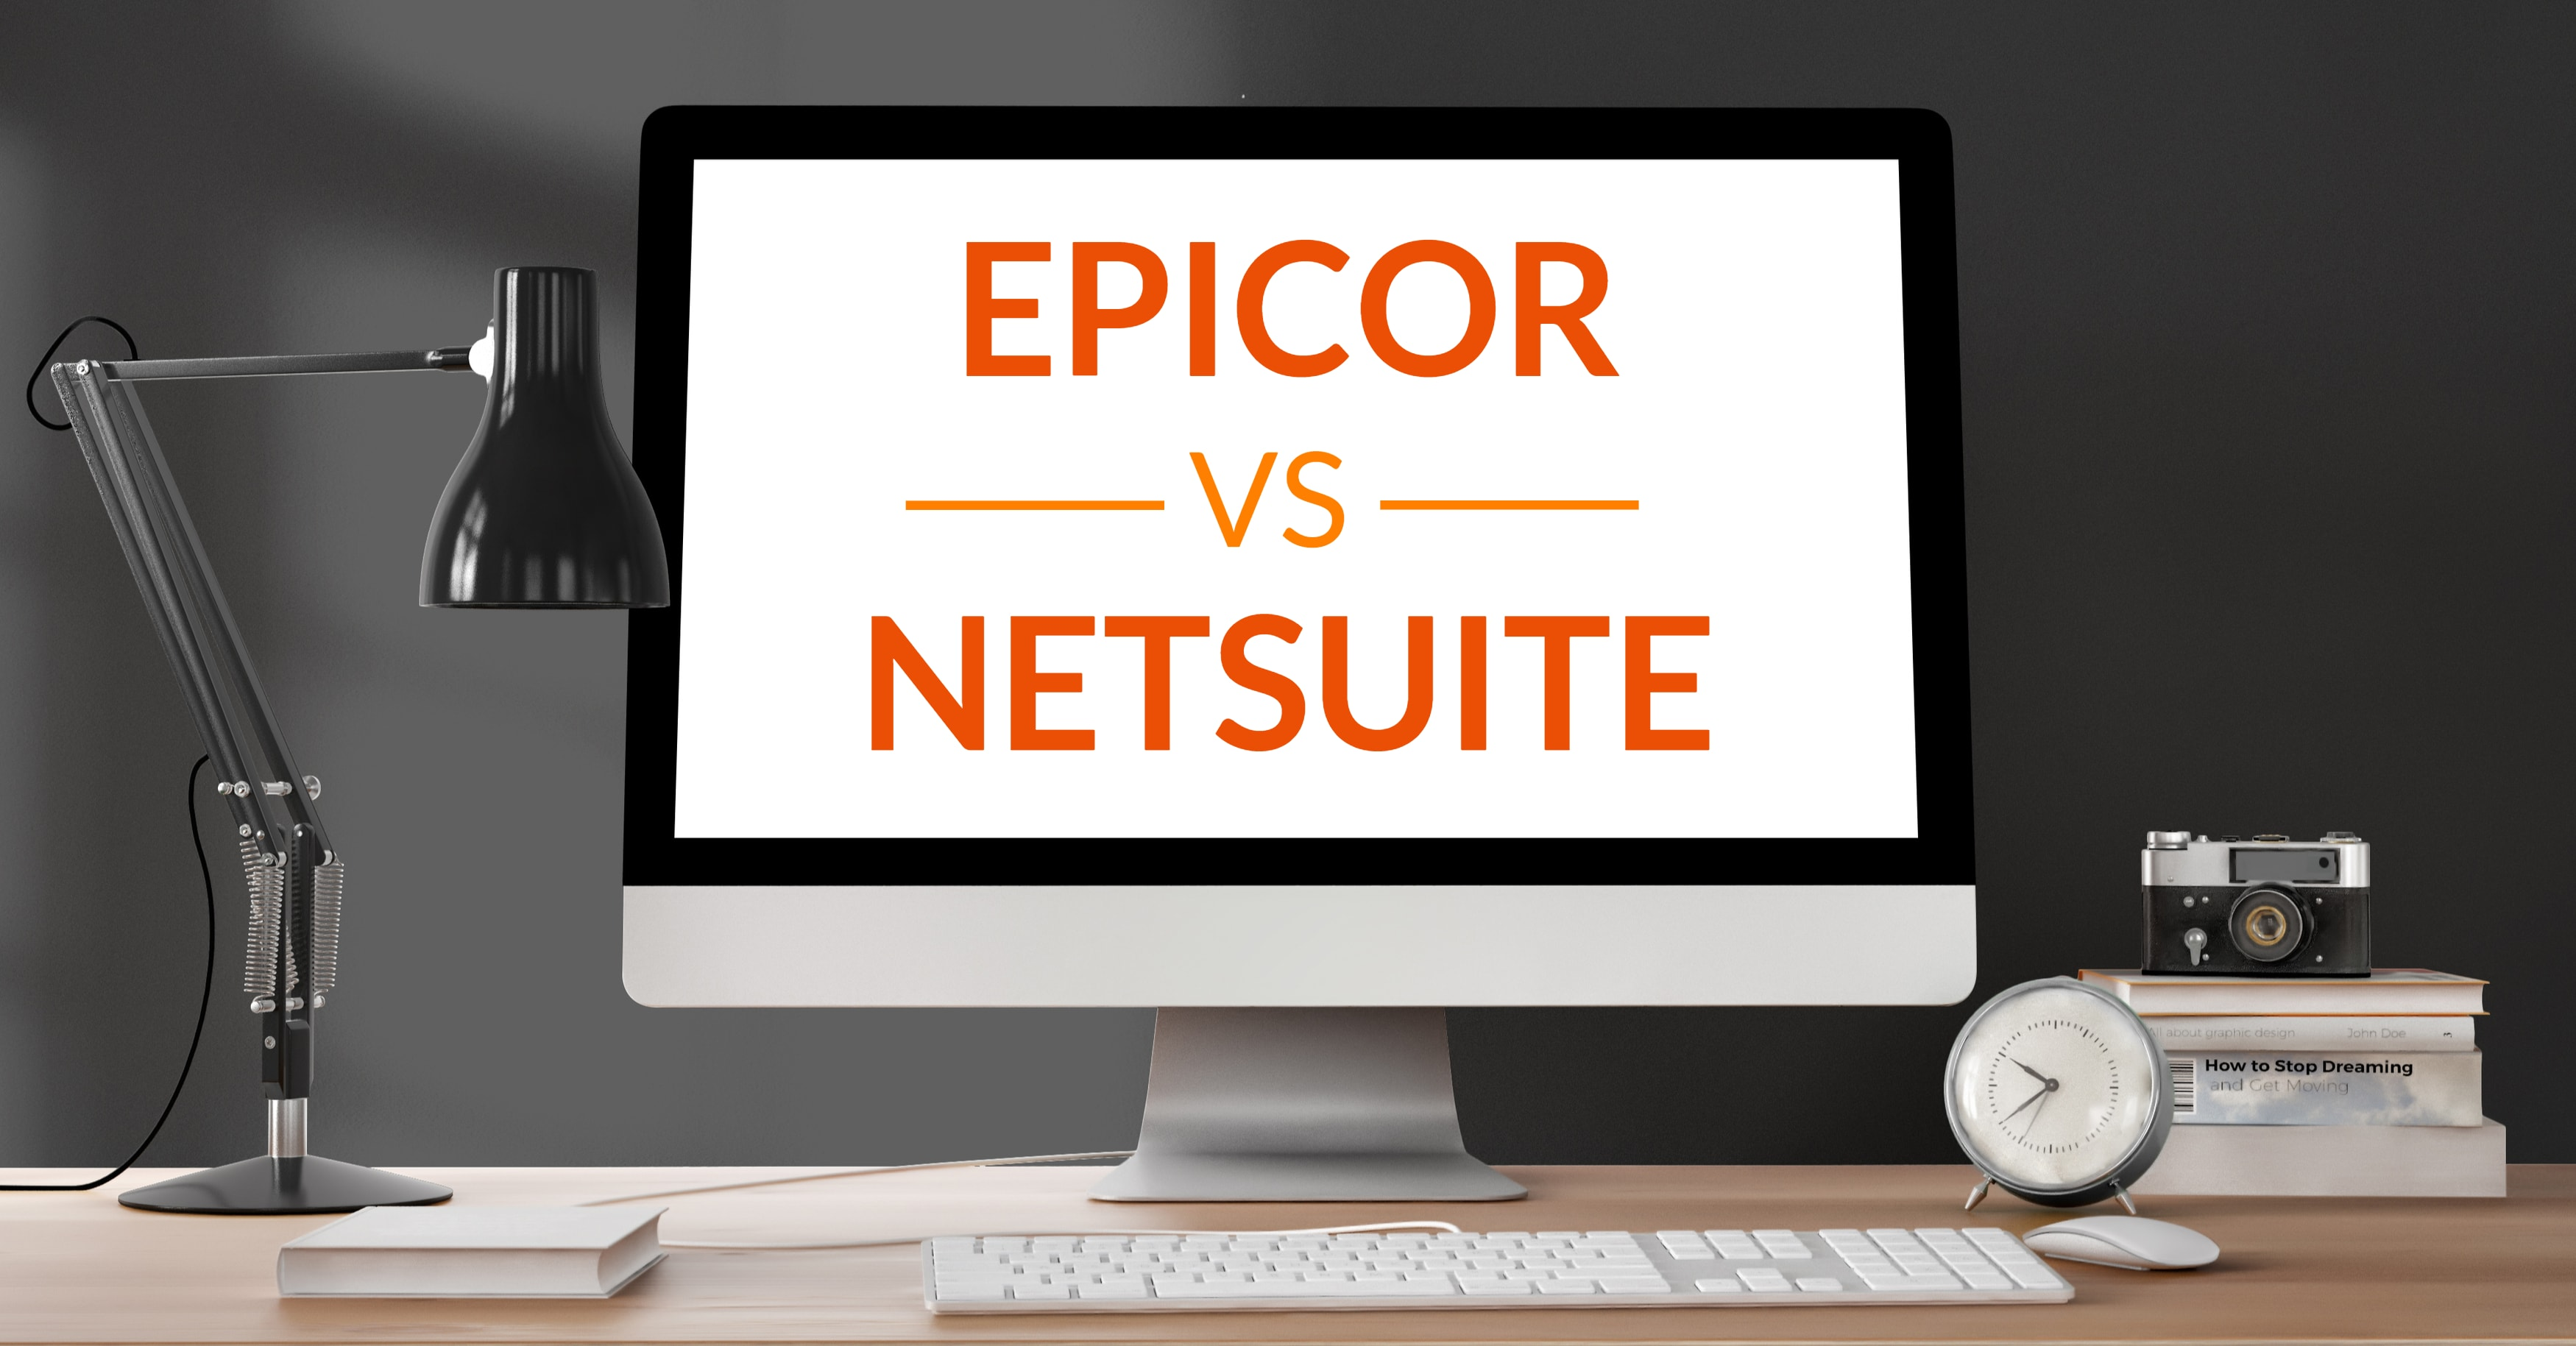 Epicor vs. NetSuite